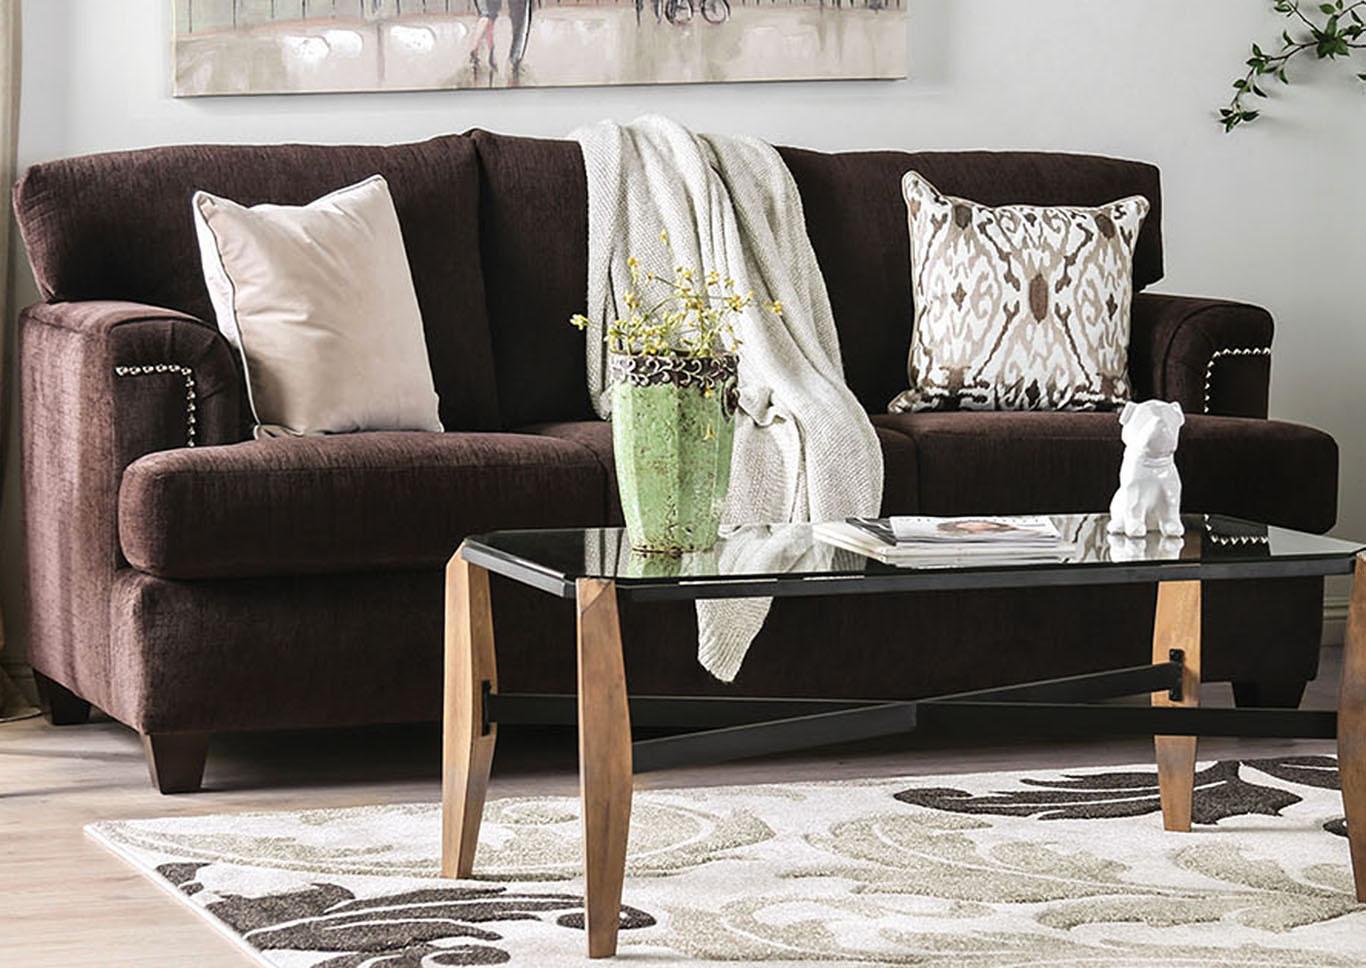 Awe Inspiring Ideal Furniture San Antonio West Brynlee Chocolate Sofa Beatyapartments Chair Design Images Beatyapartmentscom